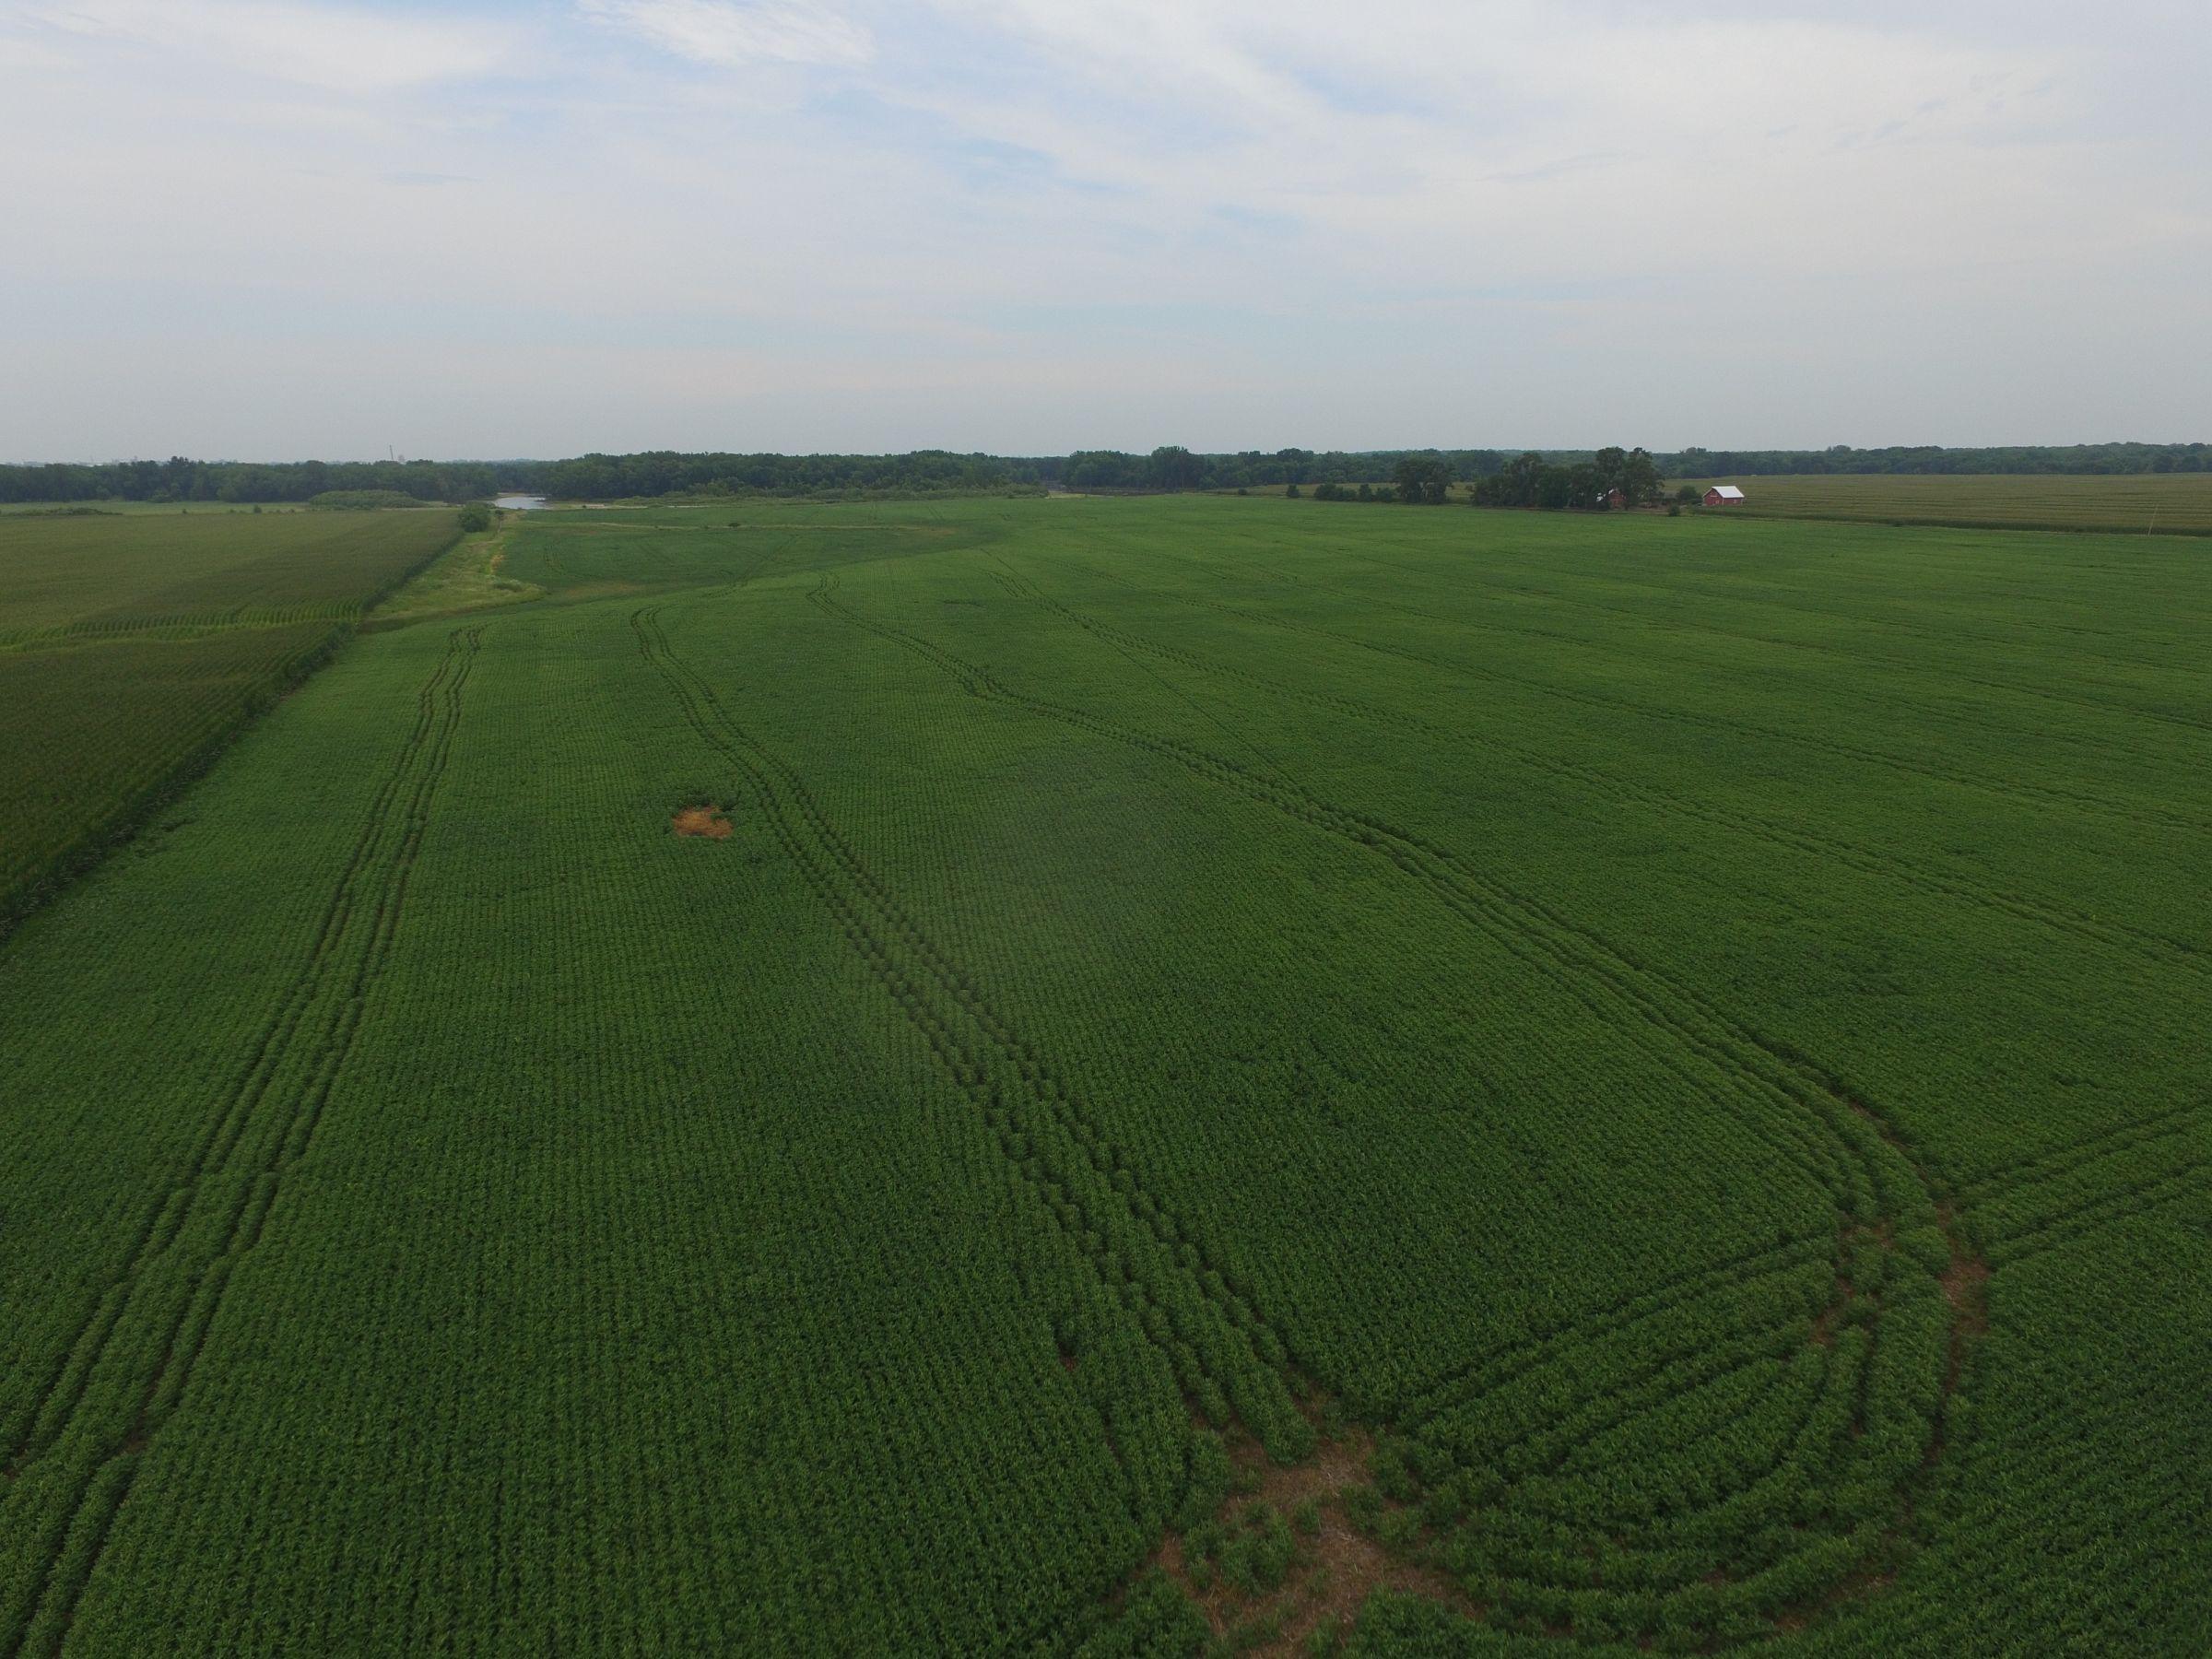 land-scott-county-iowa-80-acres-listing-number-15599-0-2021-07-27-190835.JPG